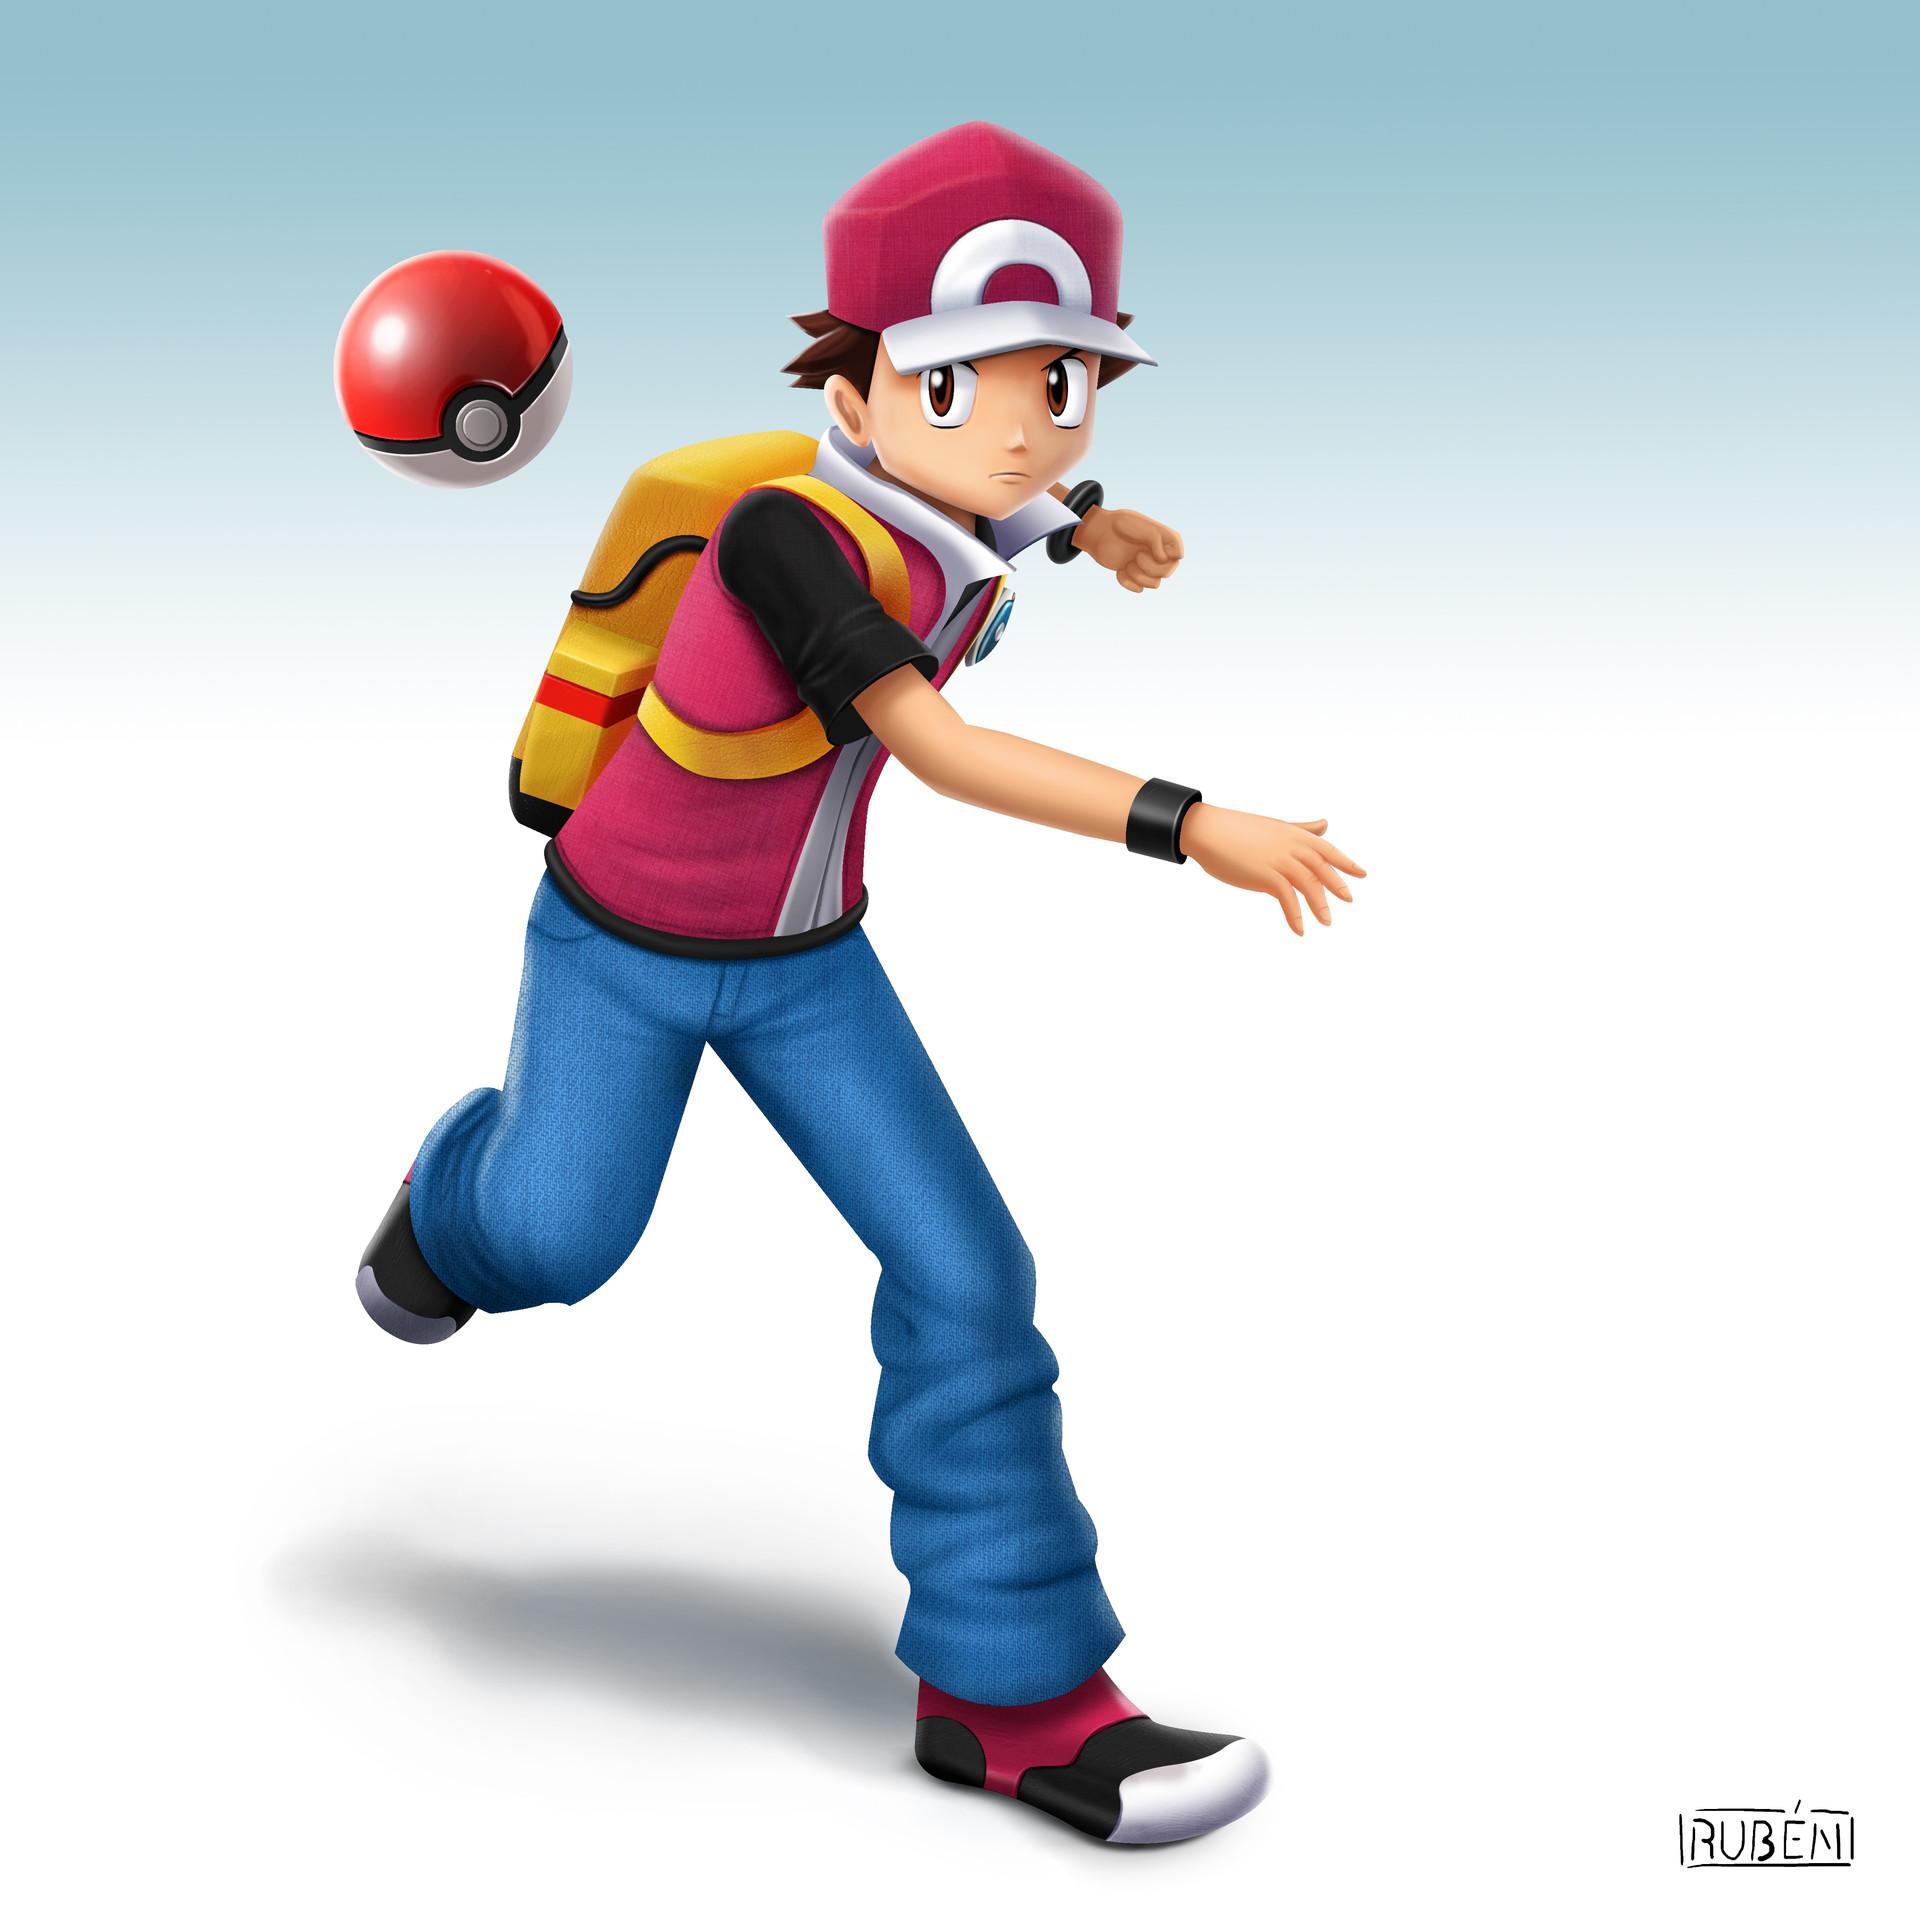 artstation pokemon trainer ssb4 rubén steven cardenas